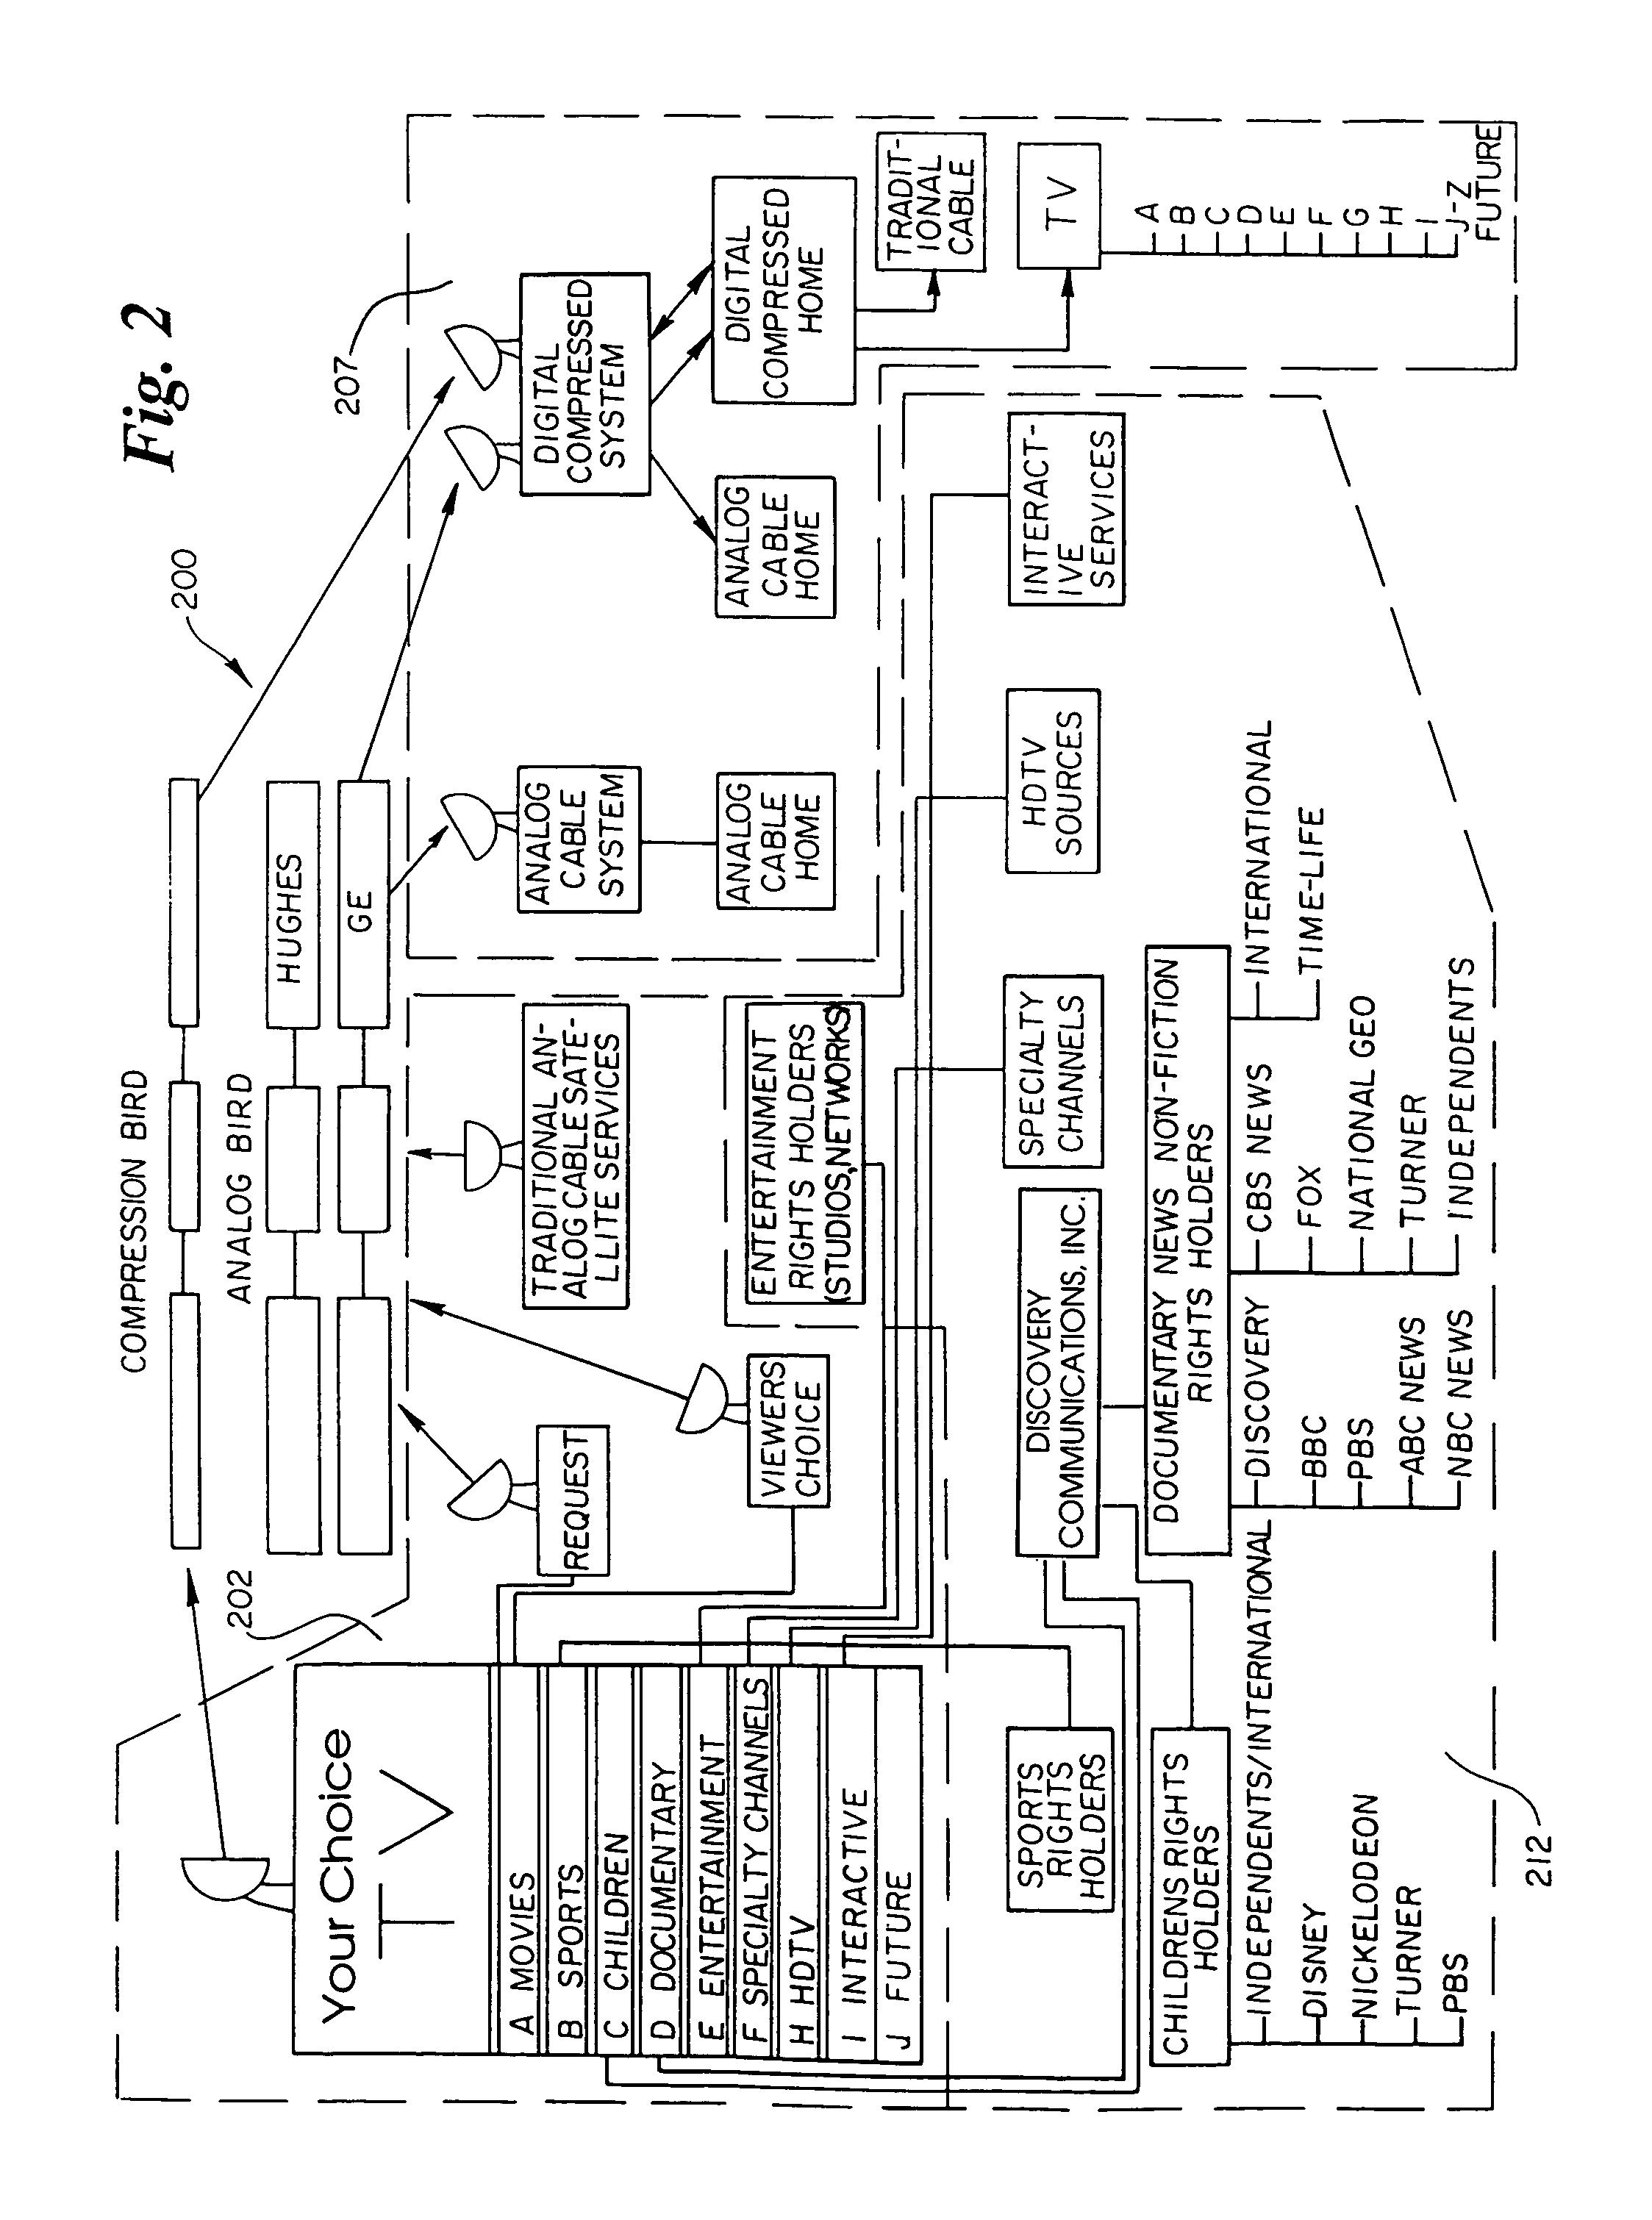 Patent Us 7017178 B1 Circuit Diagram Of Quiz Display With Seven Segment Indication Images